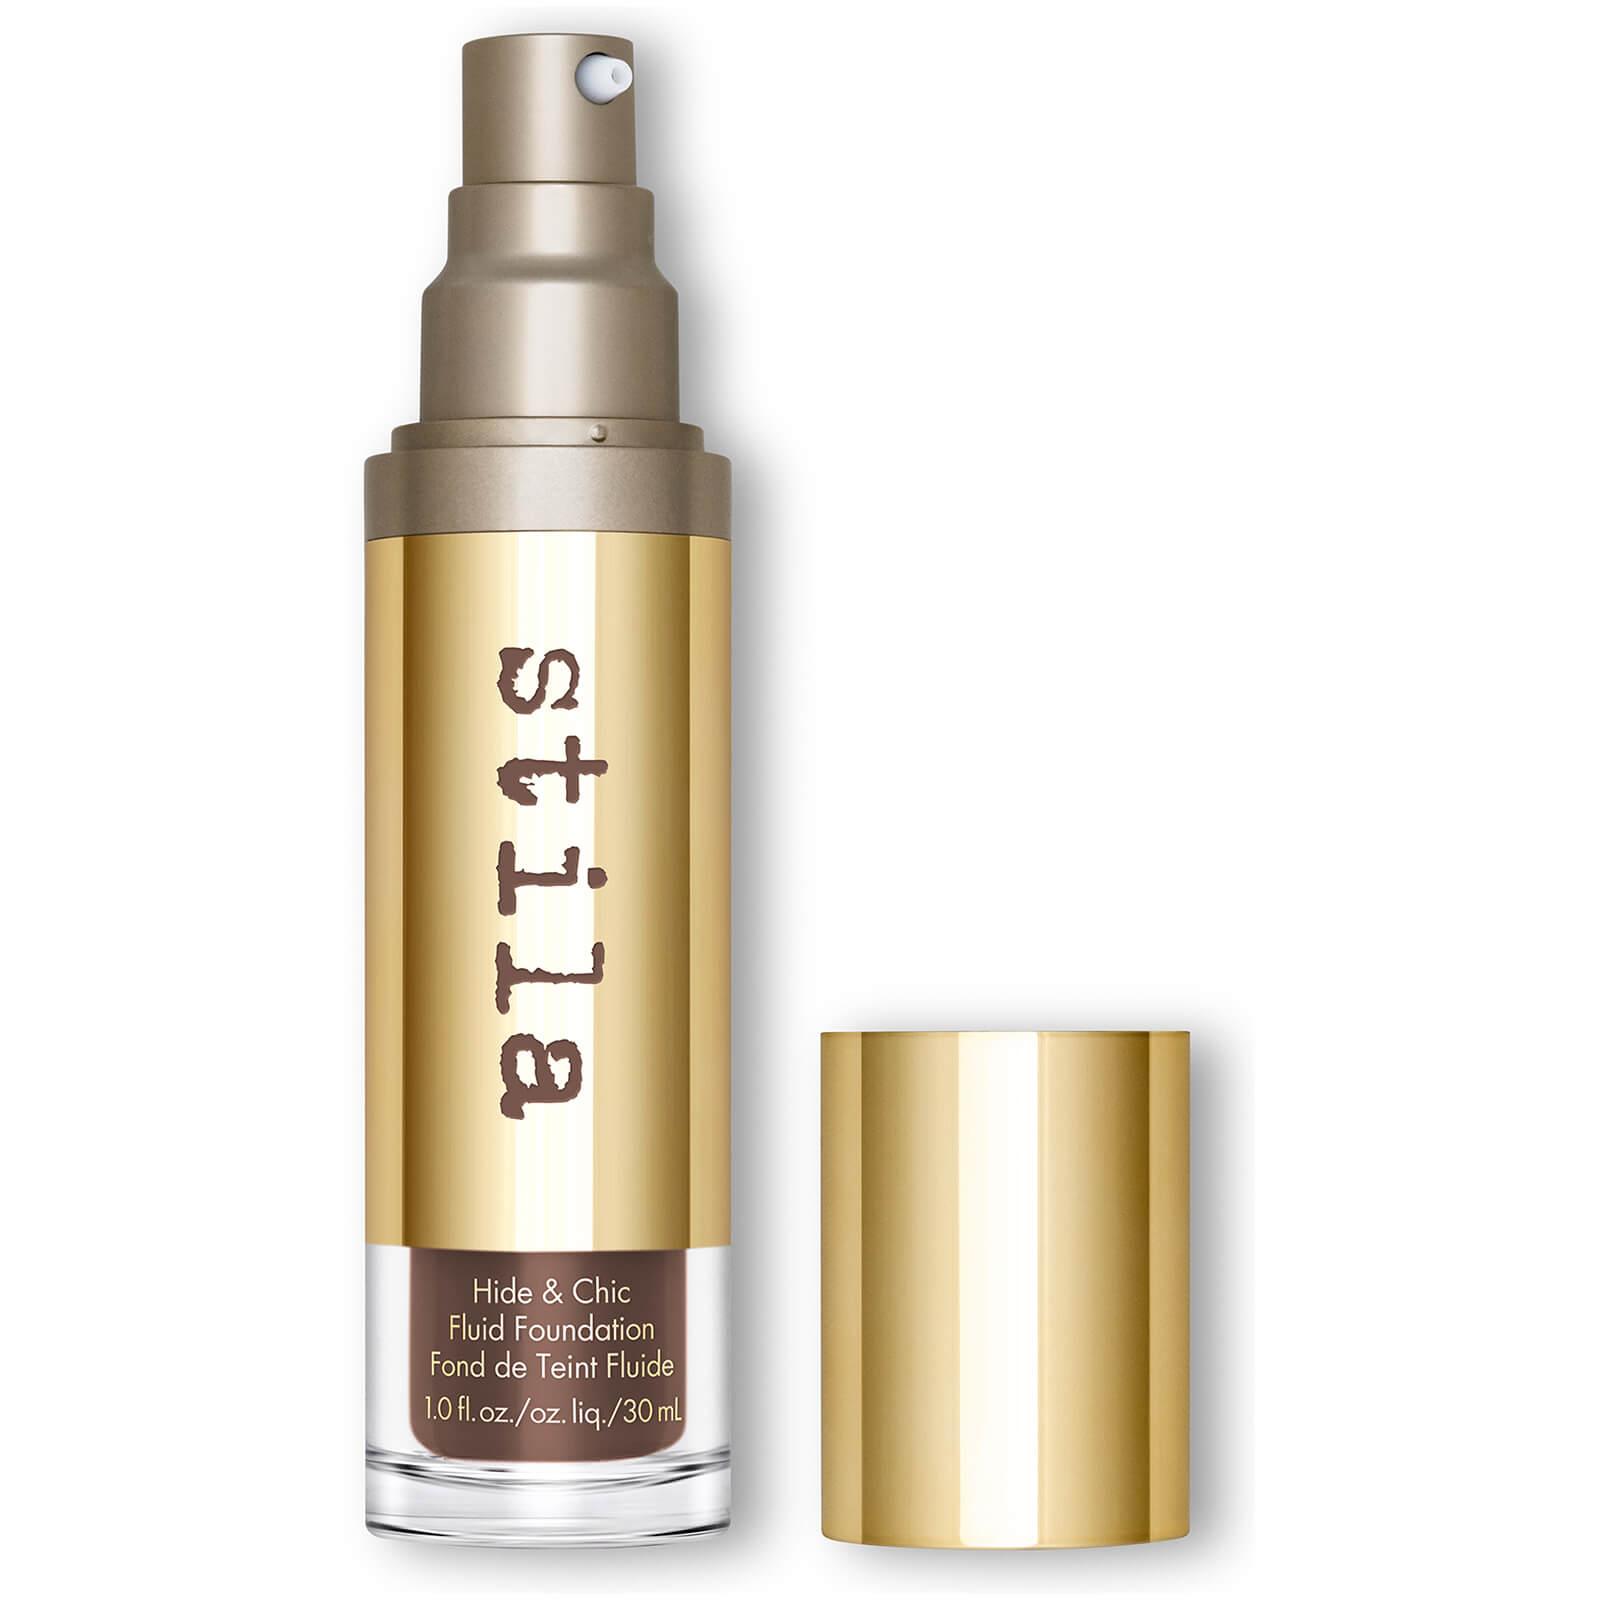 Купить Stila Hide and Chic Fluid Foundation 30ml (Various Shades) - Deep 5